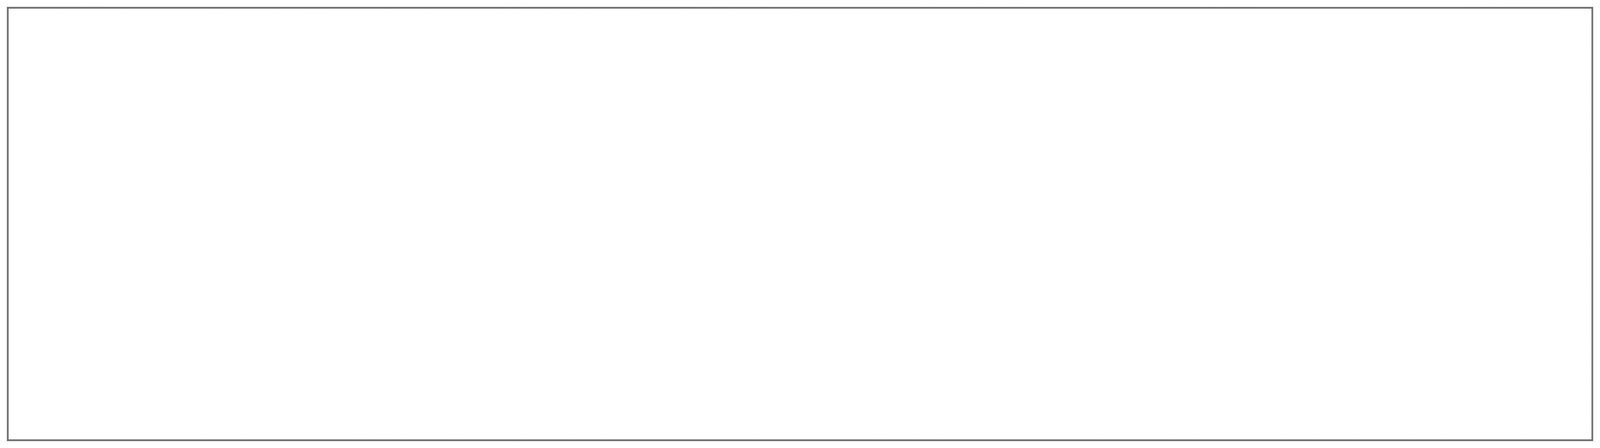 Küchenrückwand - Spritzschutz »profix«, uni weiß, 220x60 cm